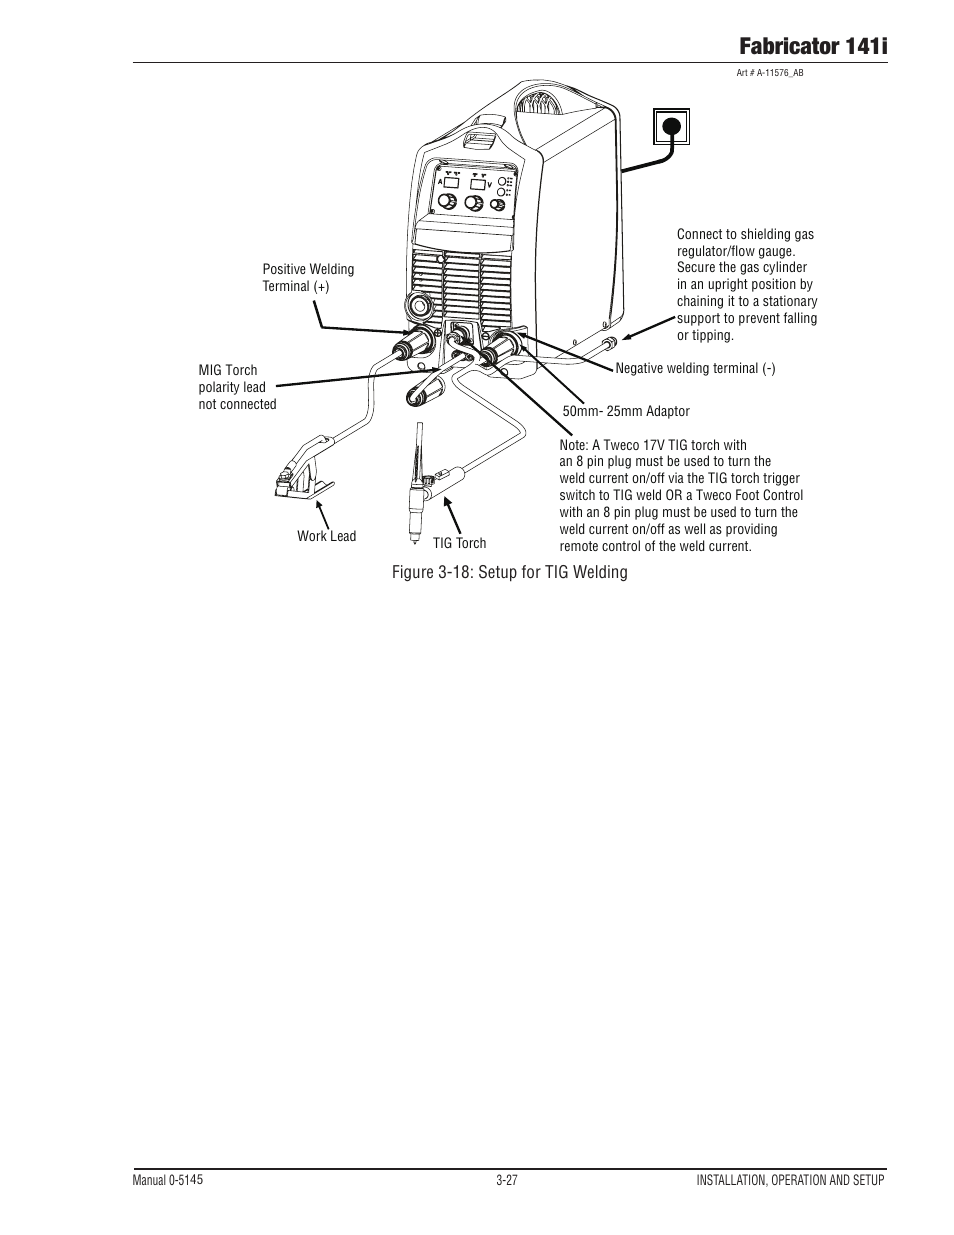 medium resolution of fabricator 141i tweco fabricator 141i operating manual user manual page 57 104